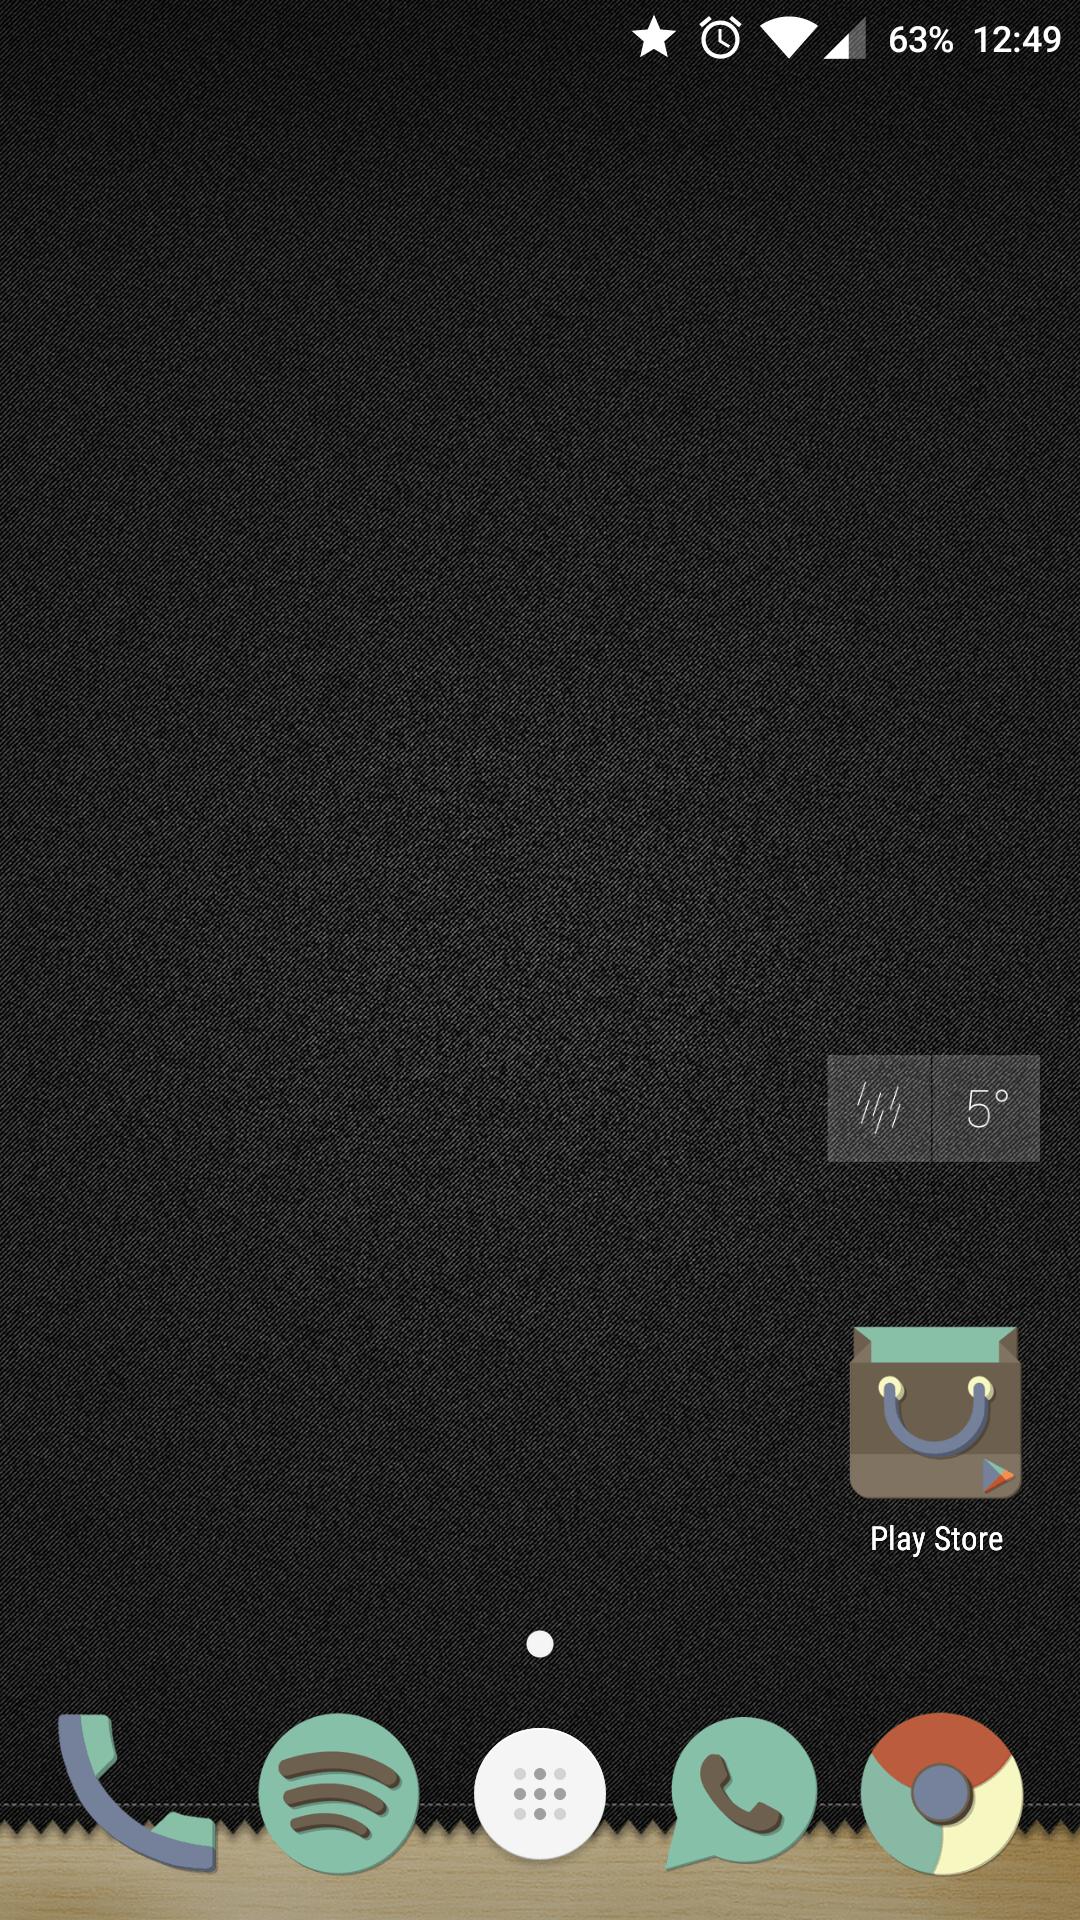 Screenshot_2016-02-23-12-49-15.png